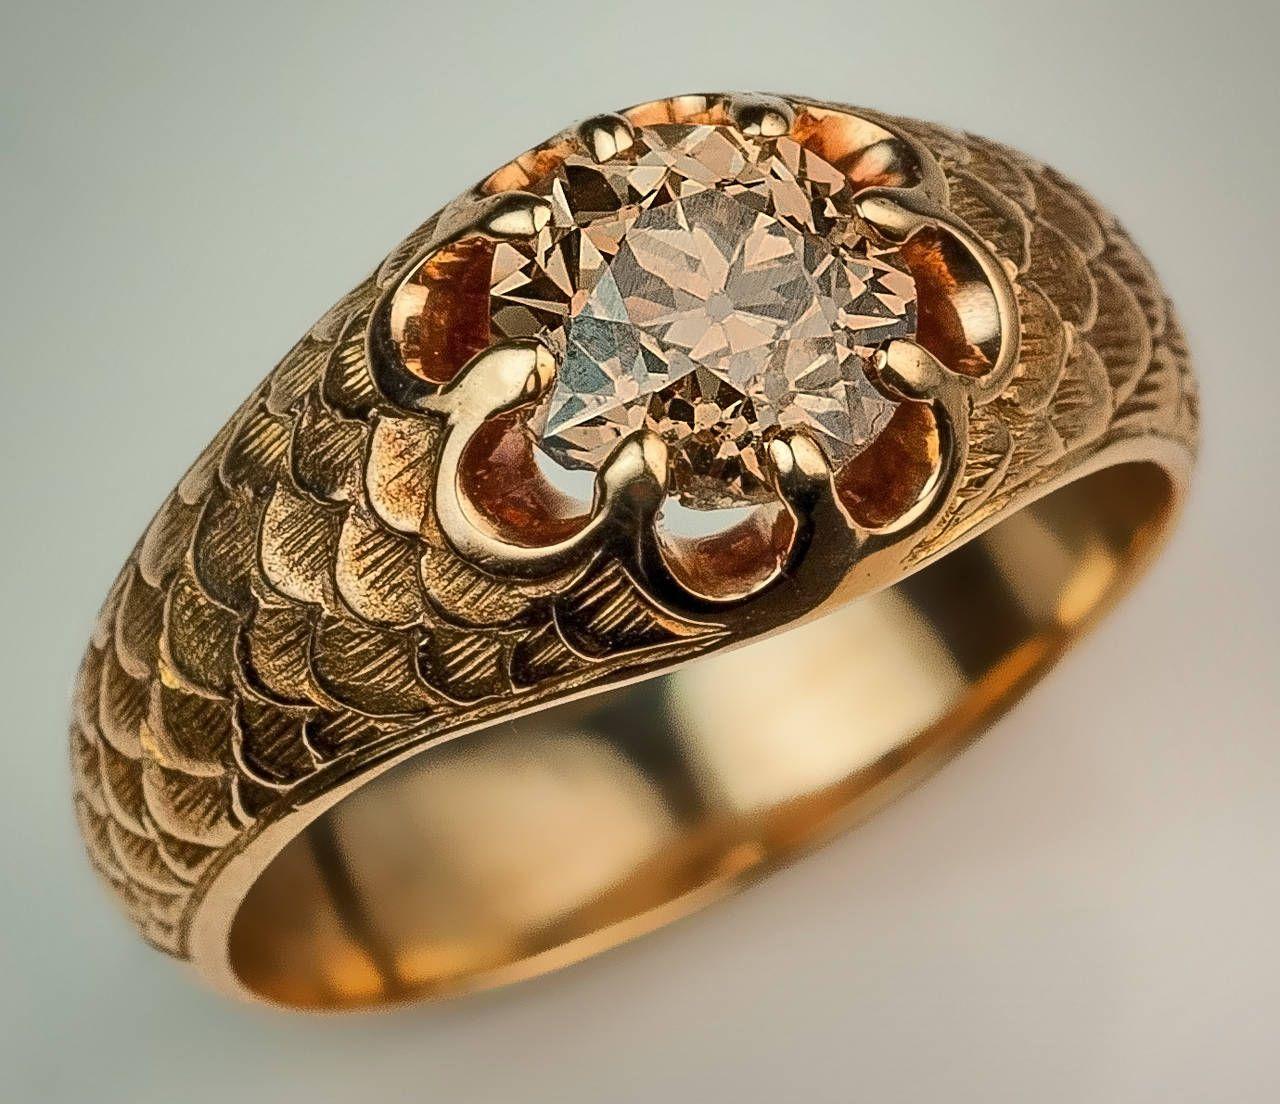 Antique Fancy Color Old European Cut Diamond Gold Mens Ring 14k